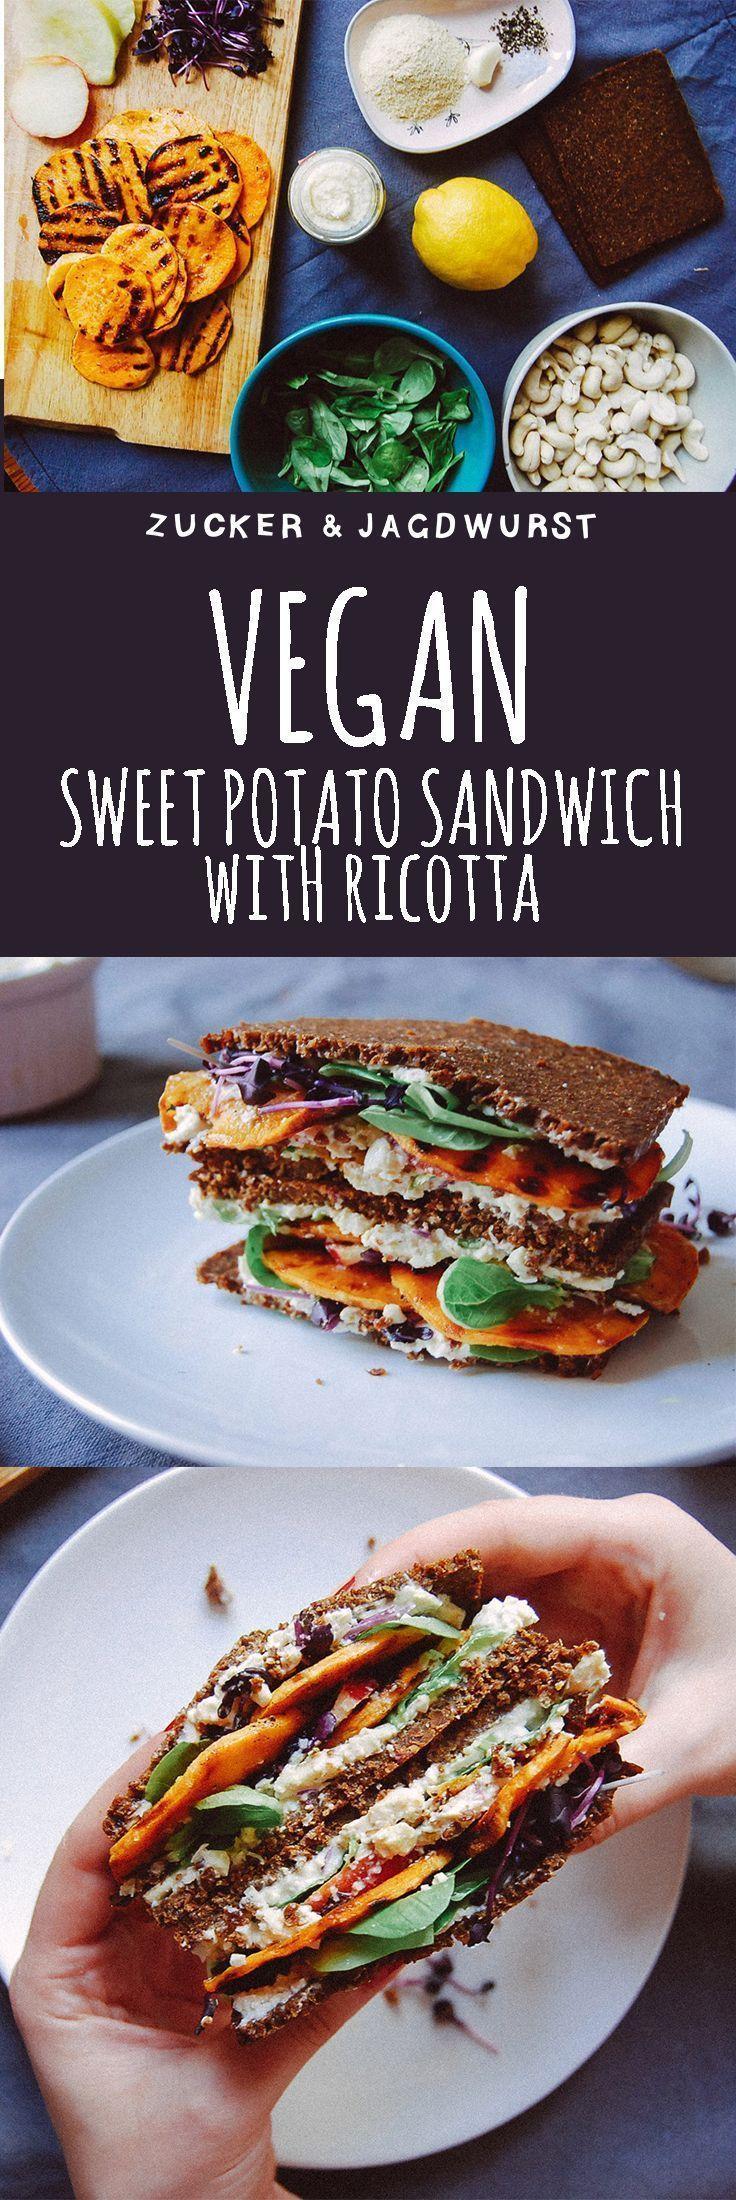 Perfect for your vegan picnic: SWEET POTATO SANDWICH WITH VEGAN HORSERADISH CASHEW RICOTTA